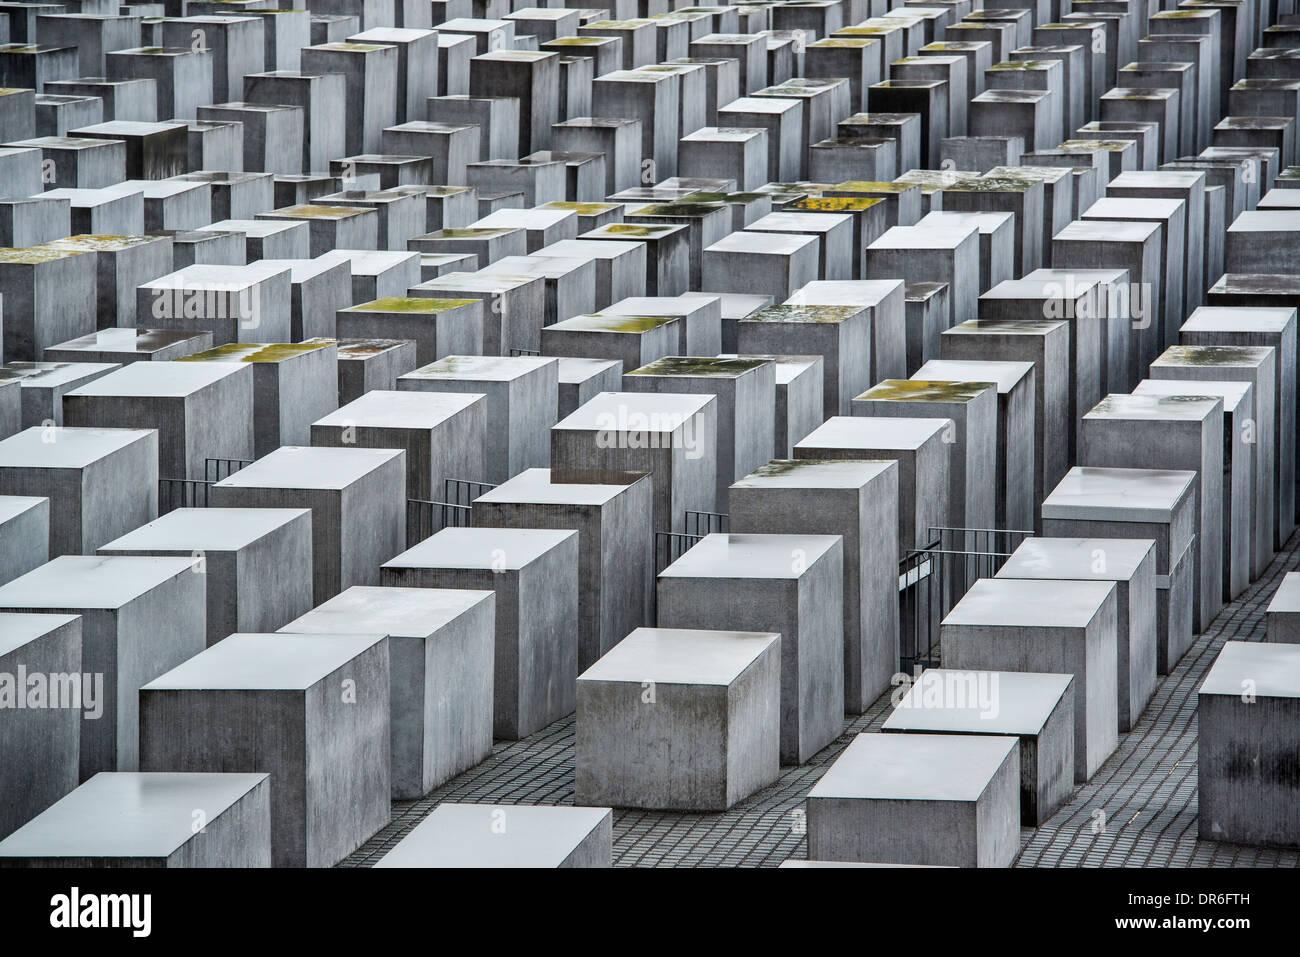 Holocaust Memorial in Berlin, Germany. - Stock Image